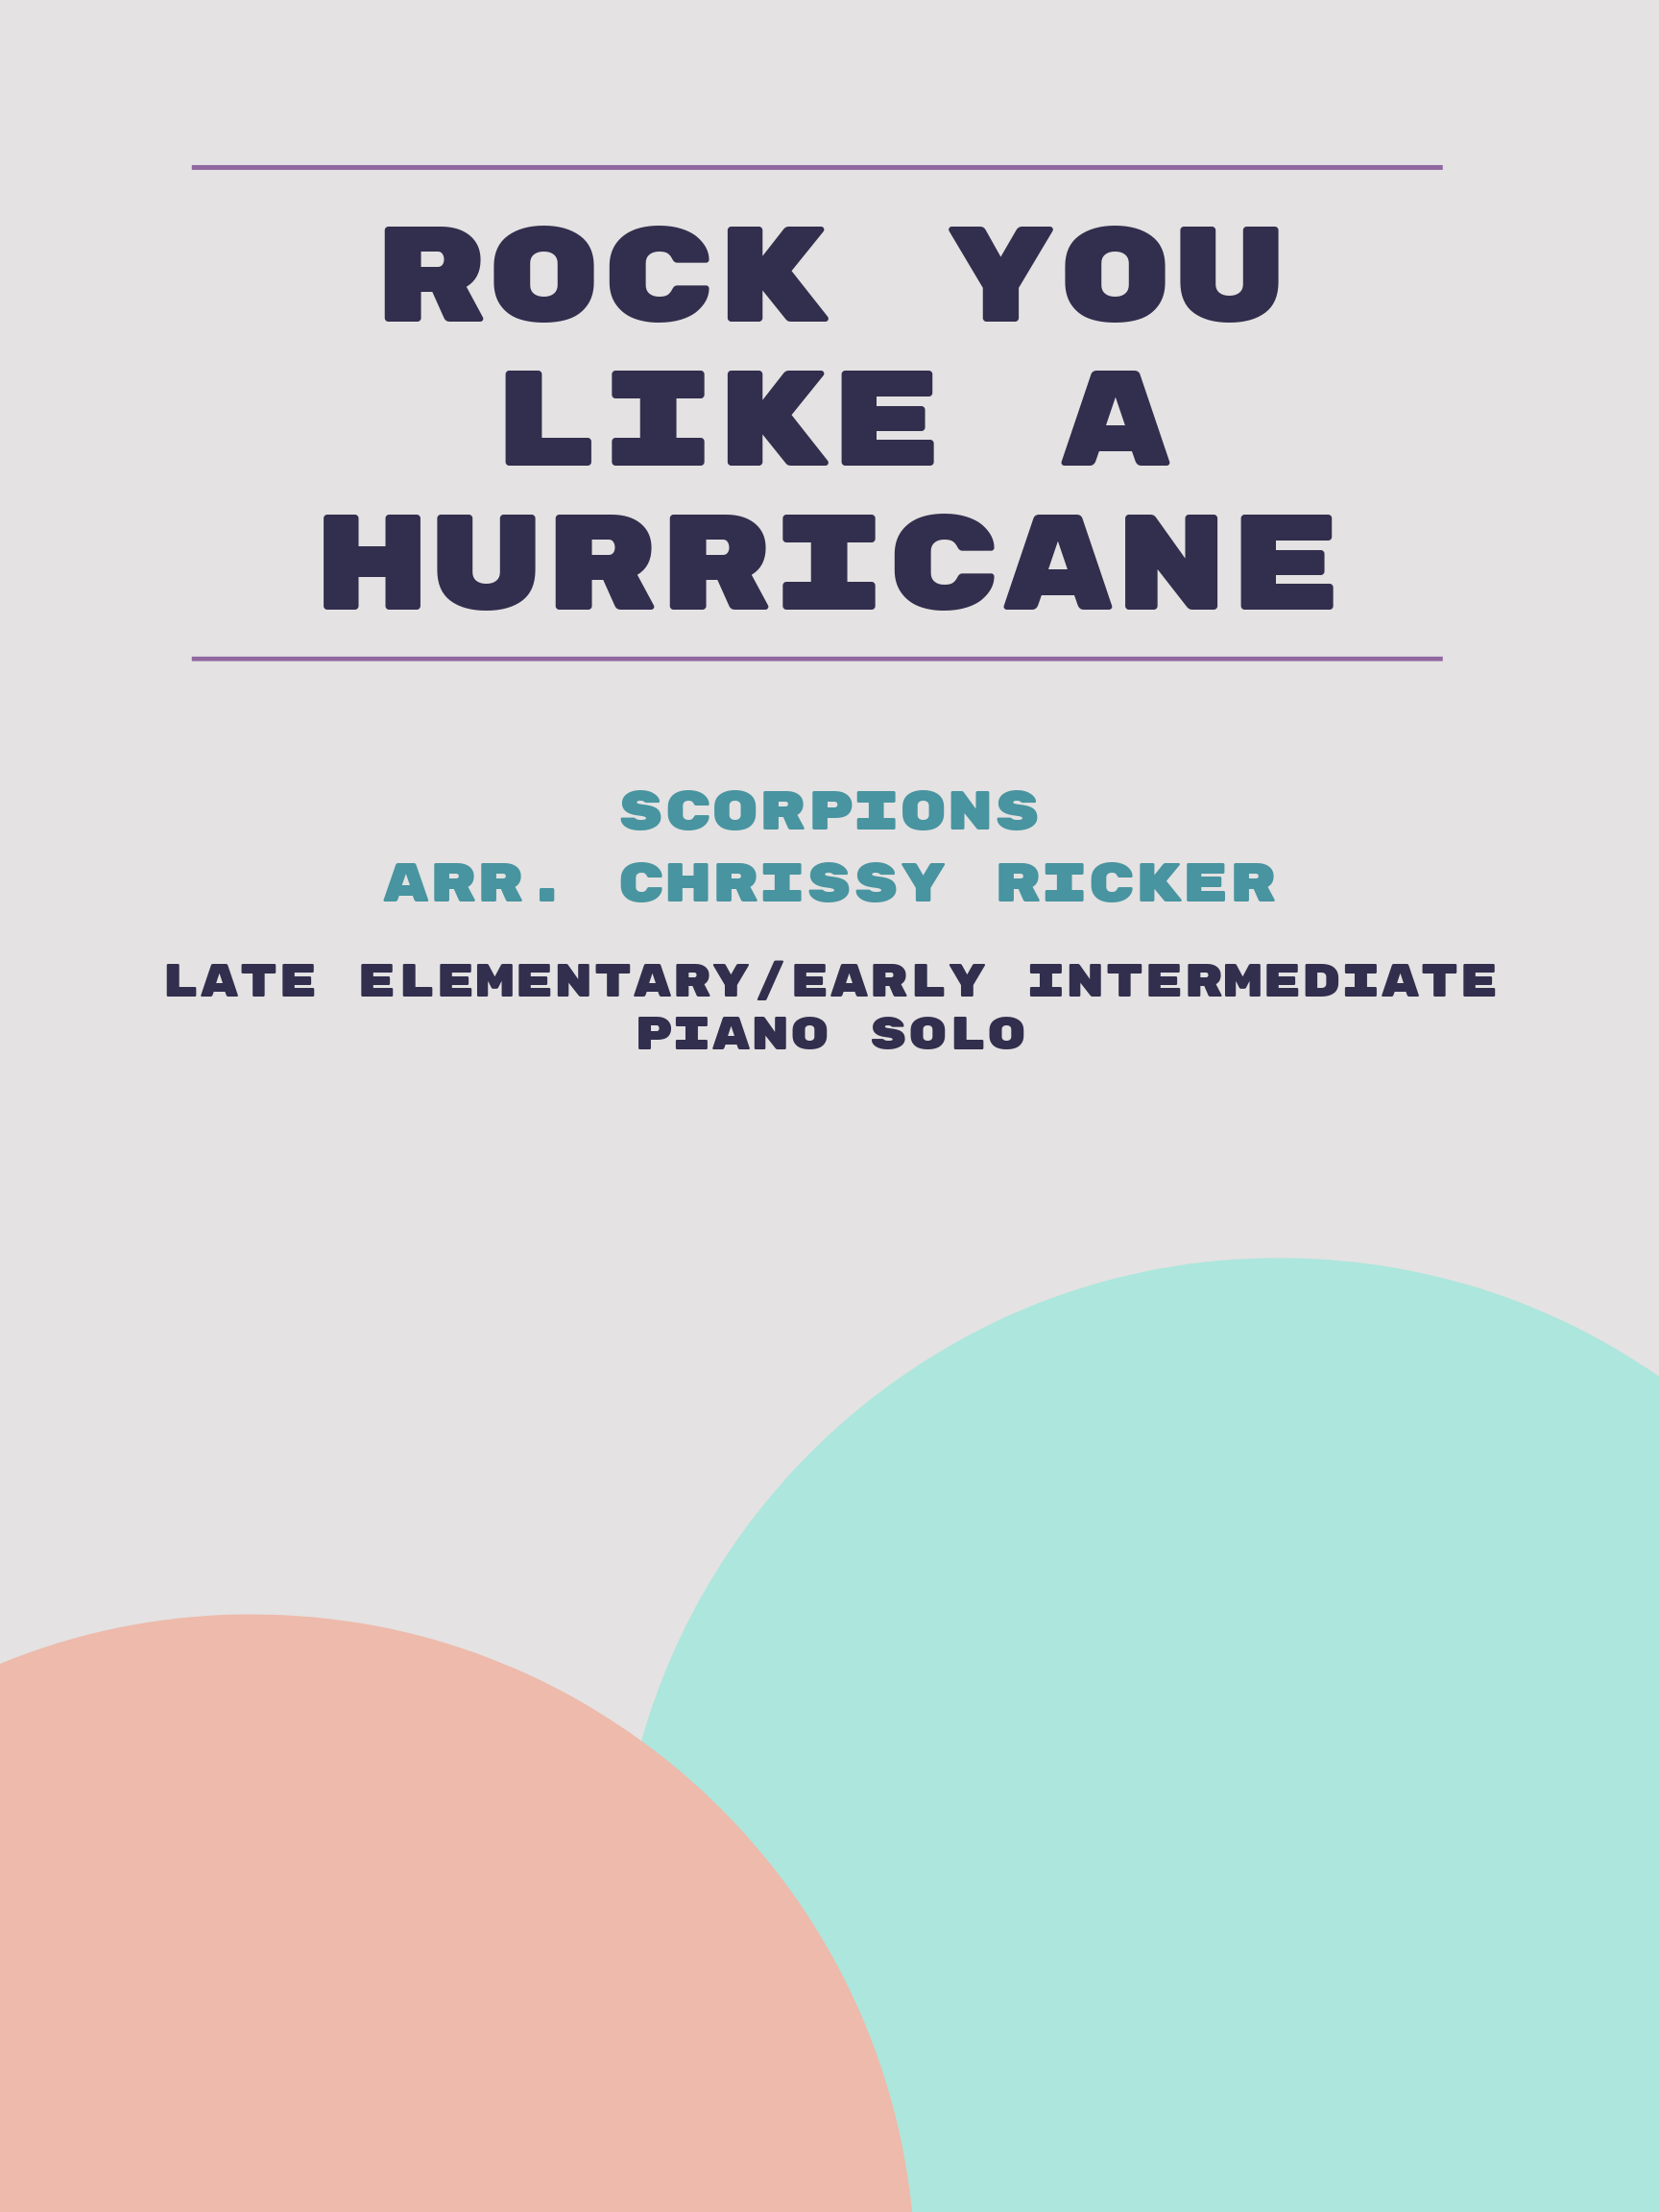 Rock You Like a Hurricane by Scorpions